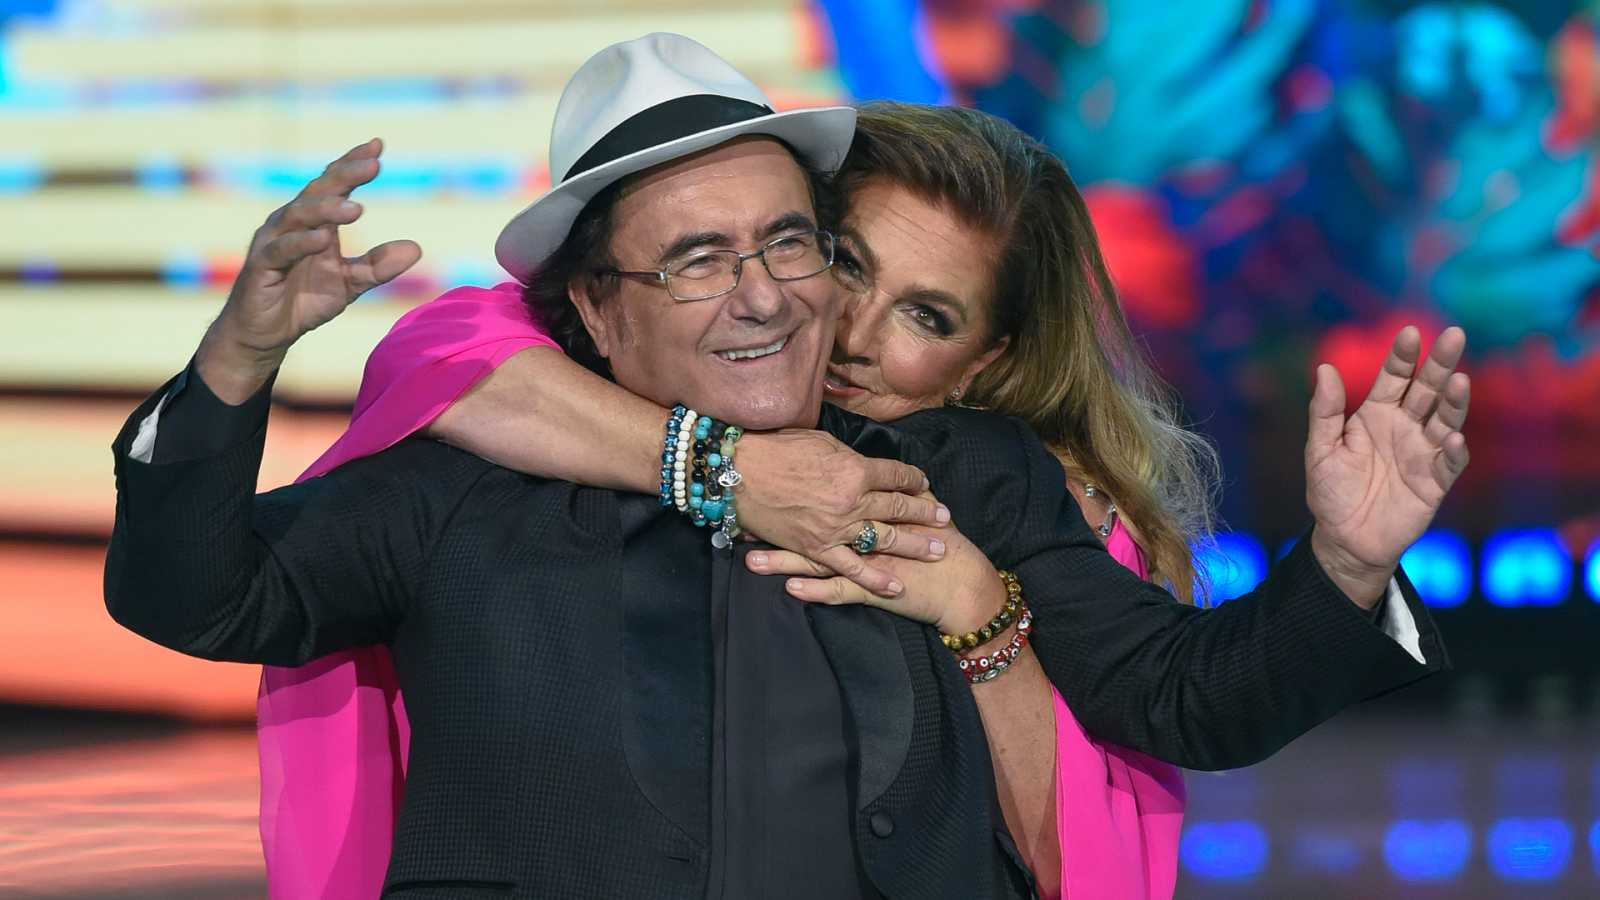 Al Bano y Romina, el gran amor que les unió